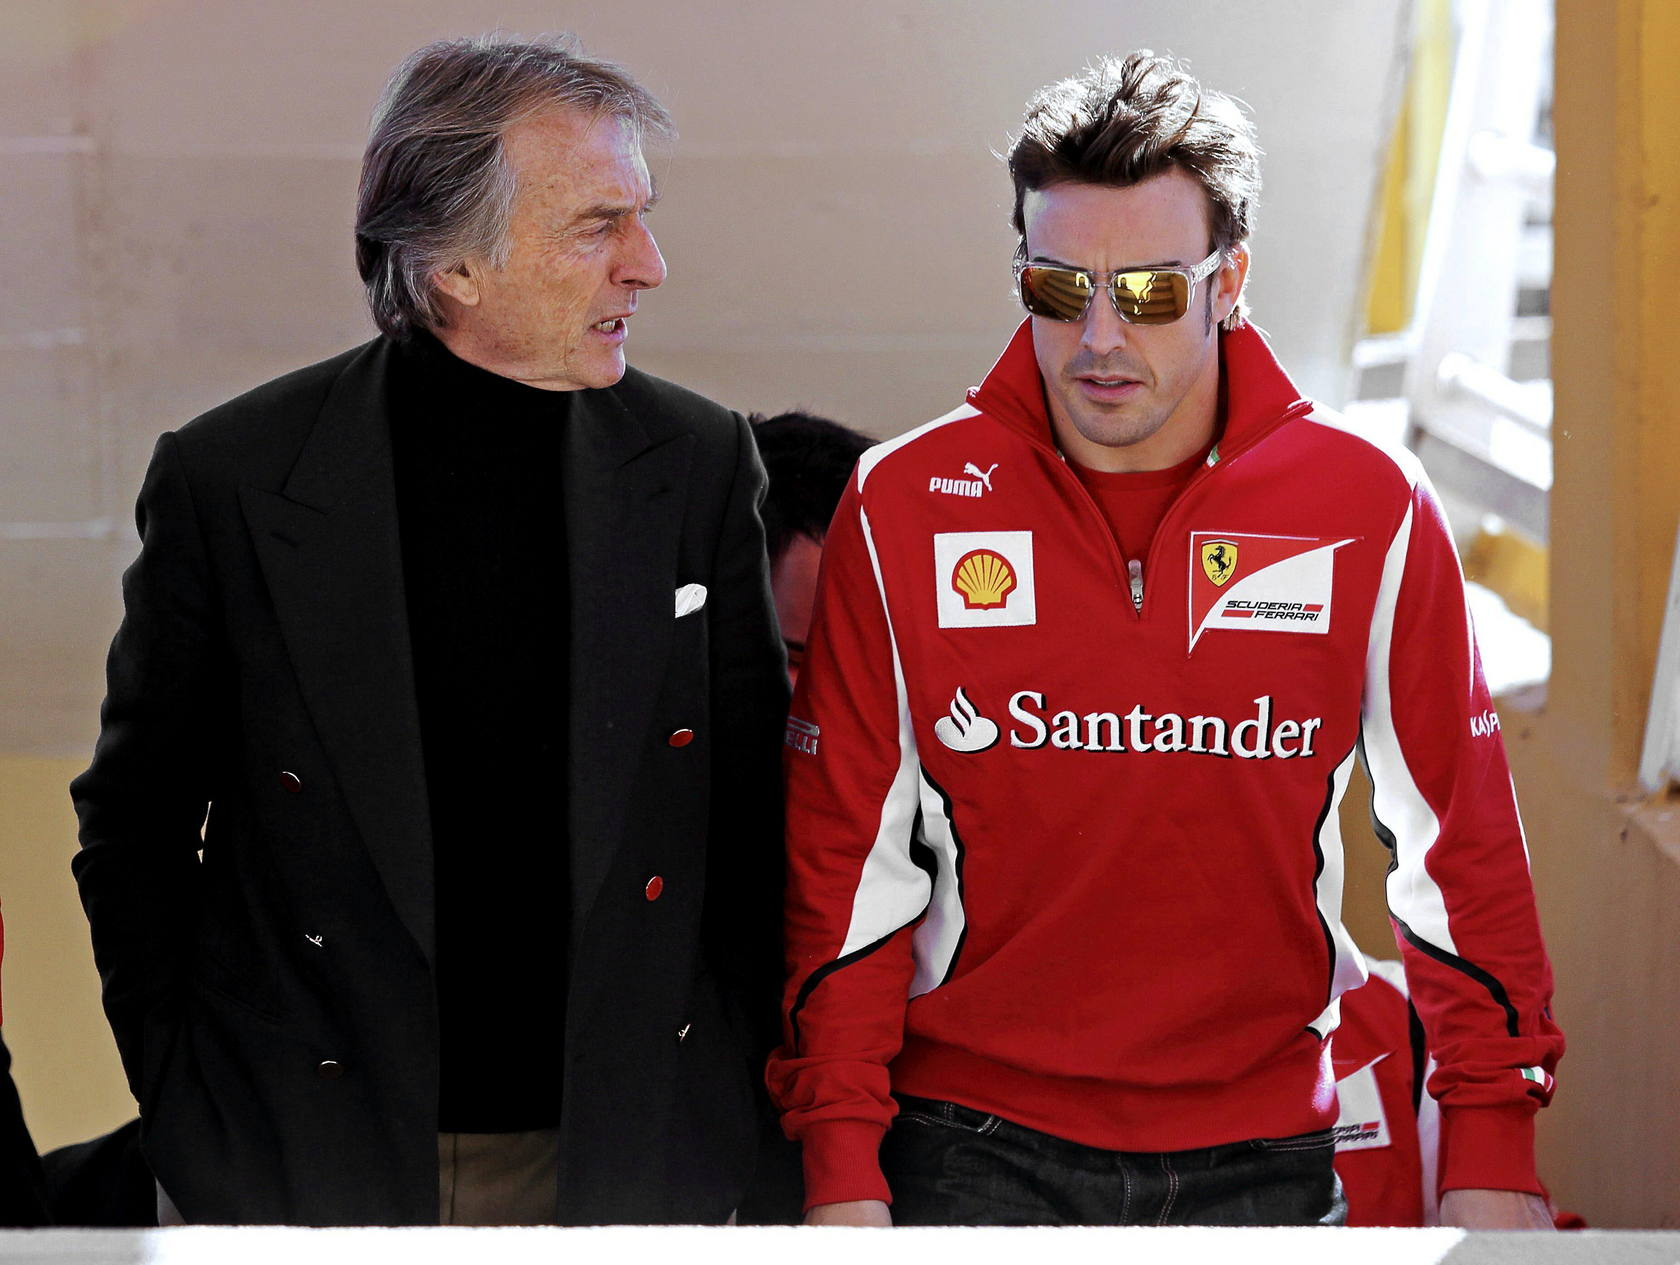 Ferrari World Finals en el circuito en Cheste